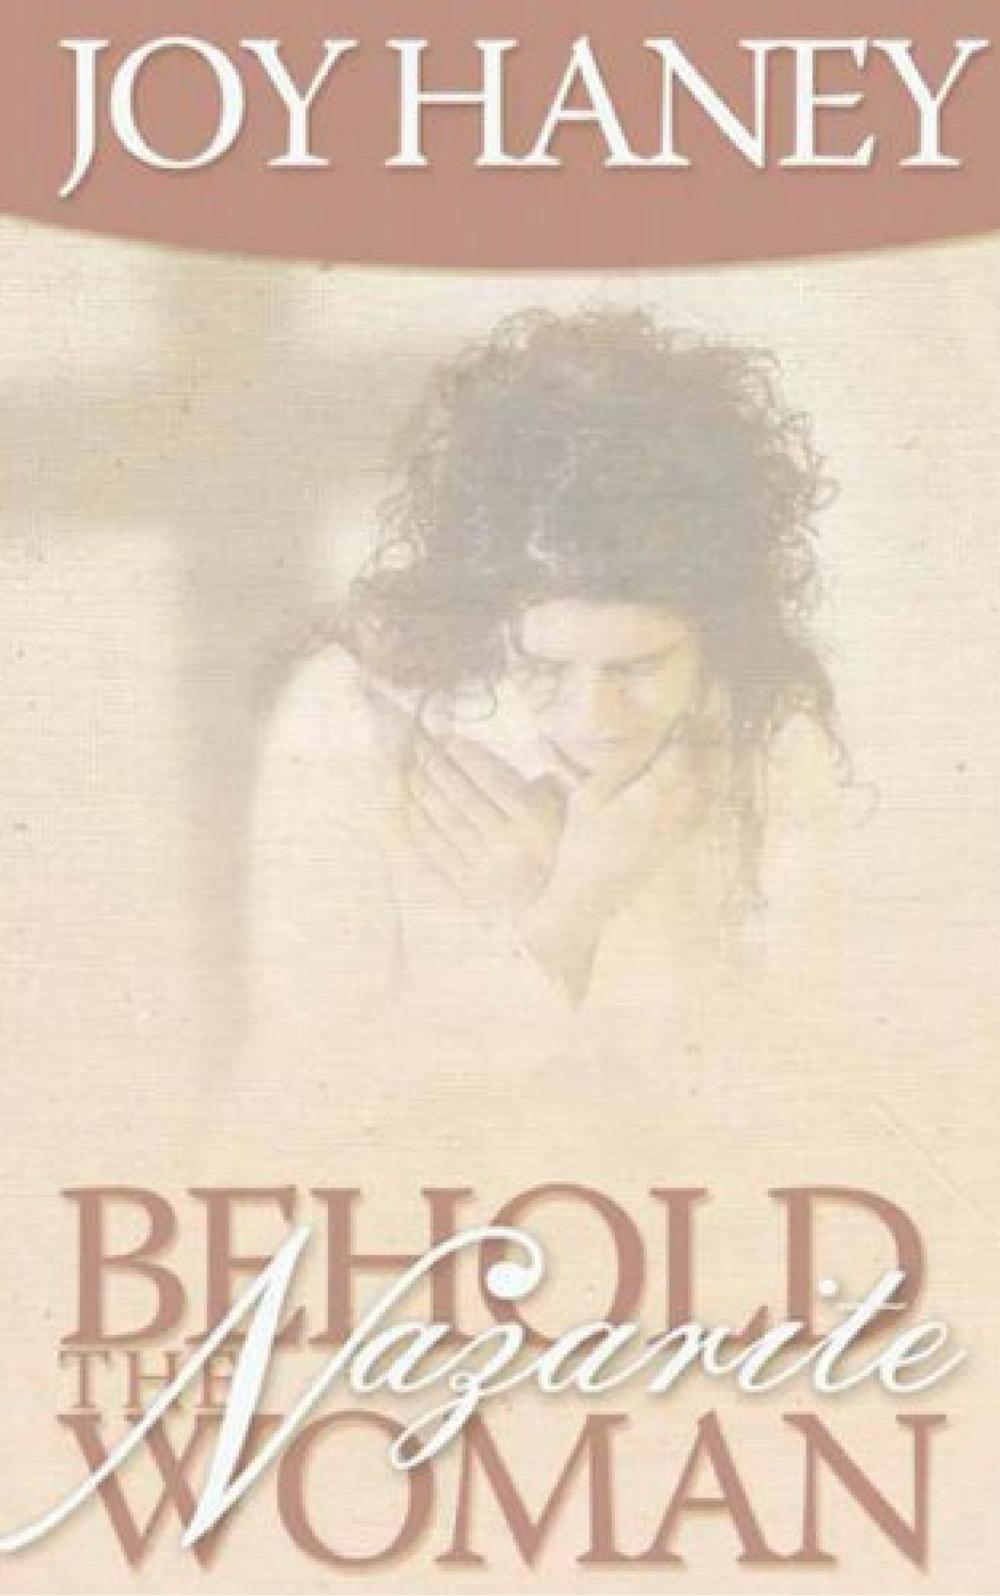 Behold-The-Nazarite-Woman.jpg